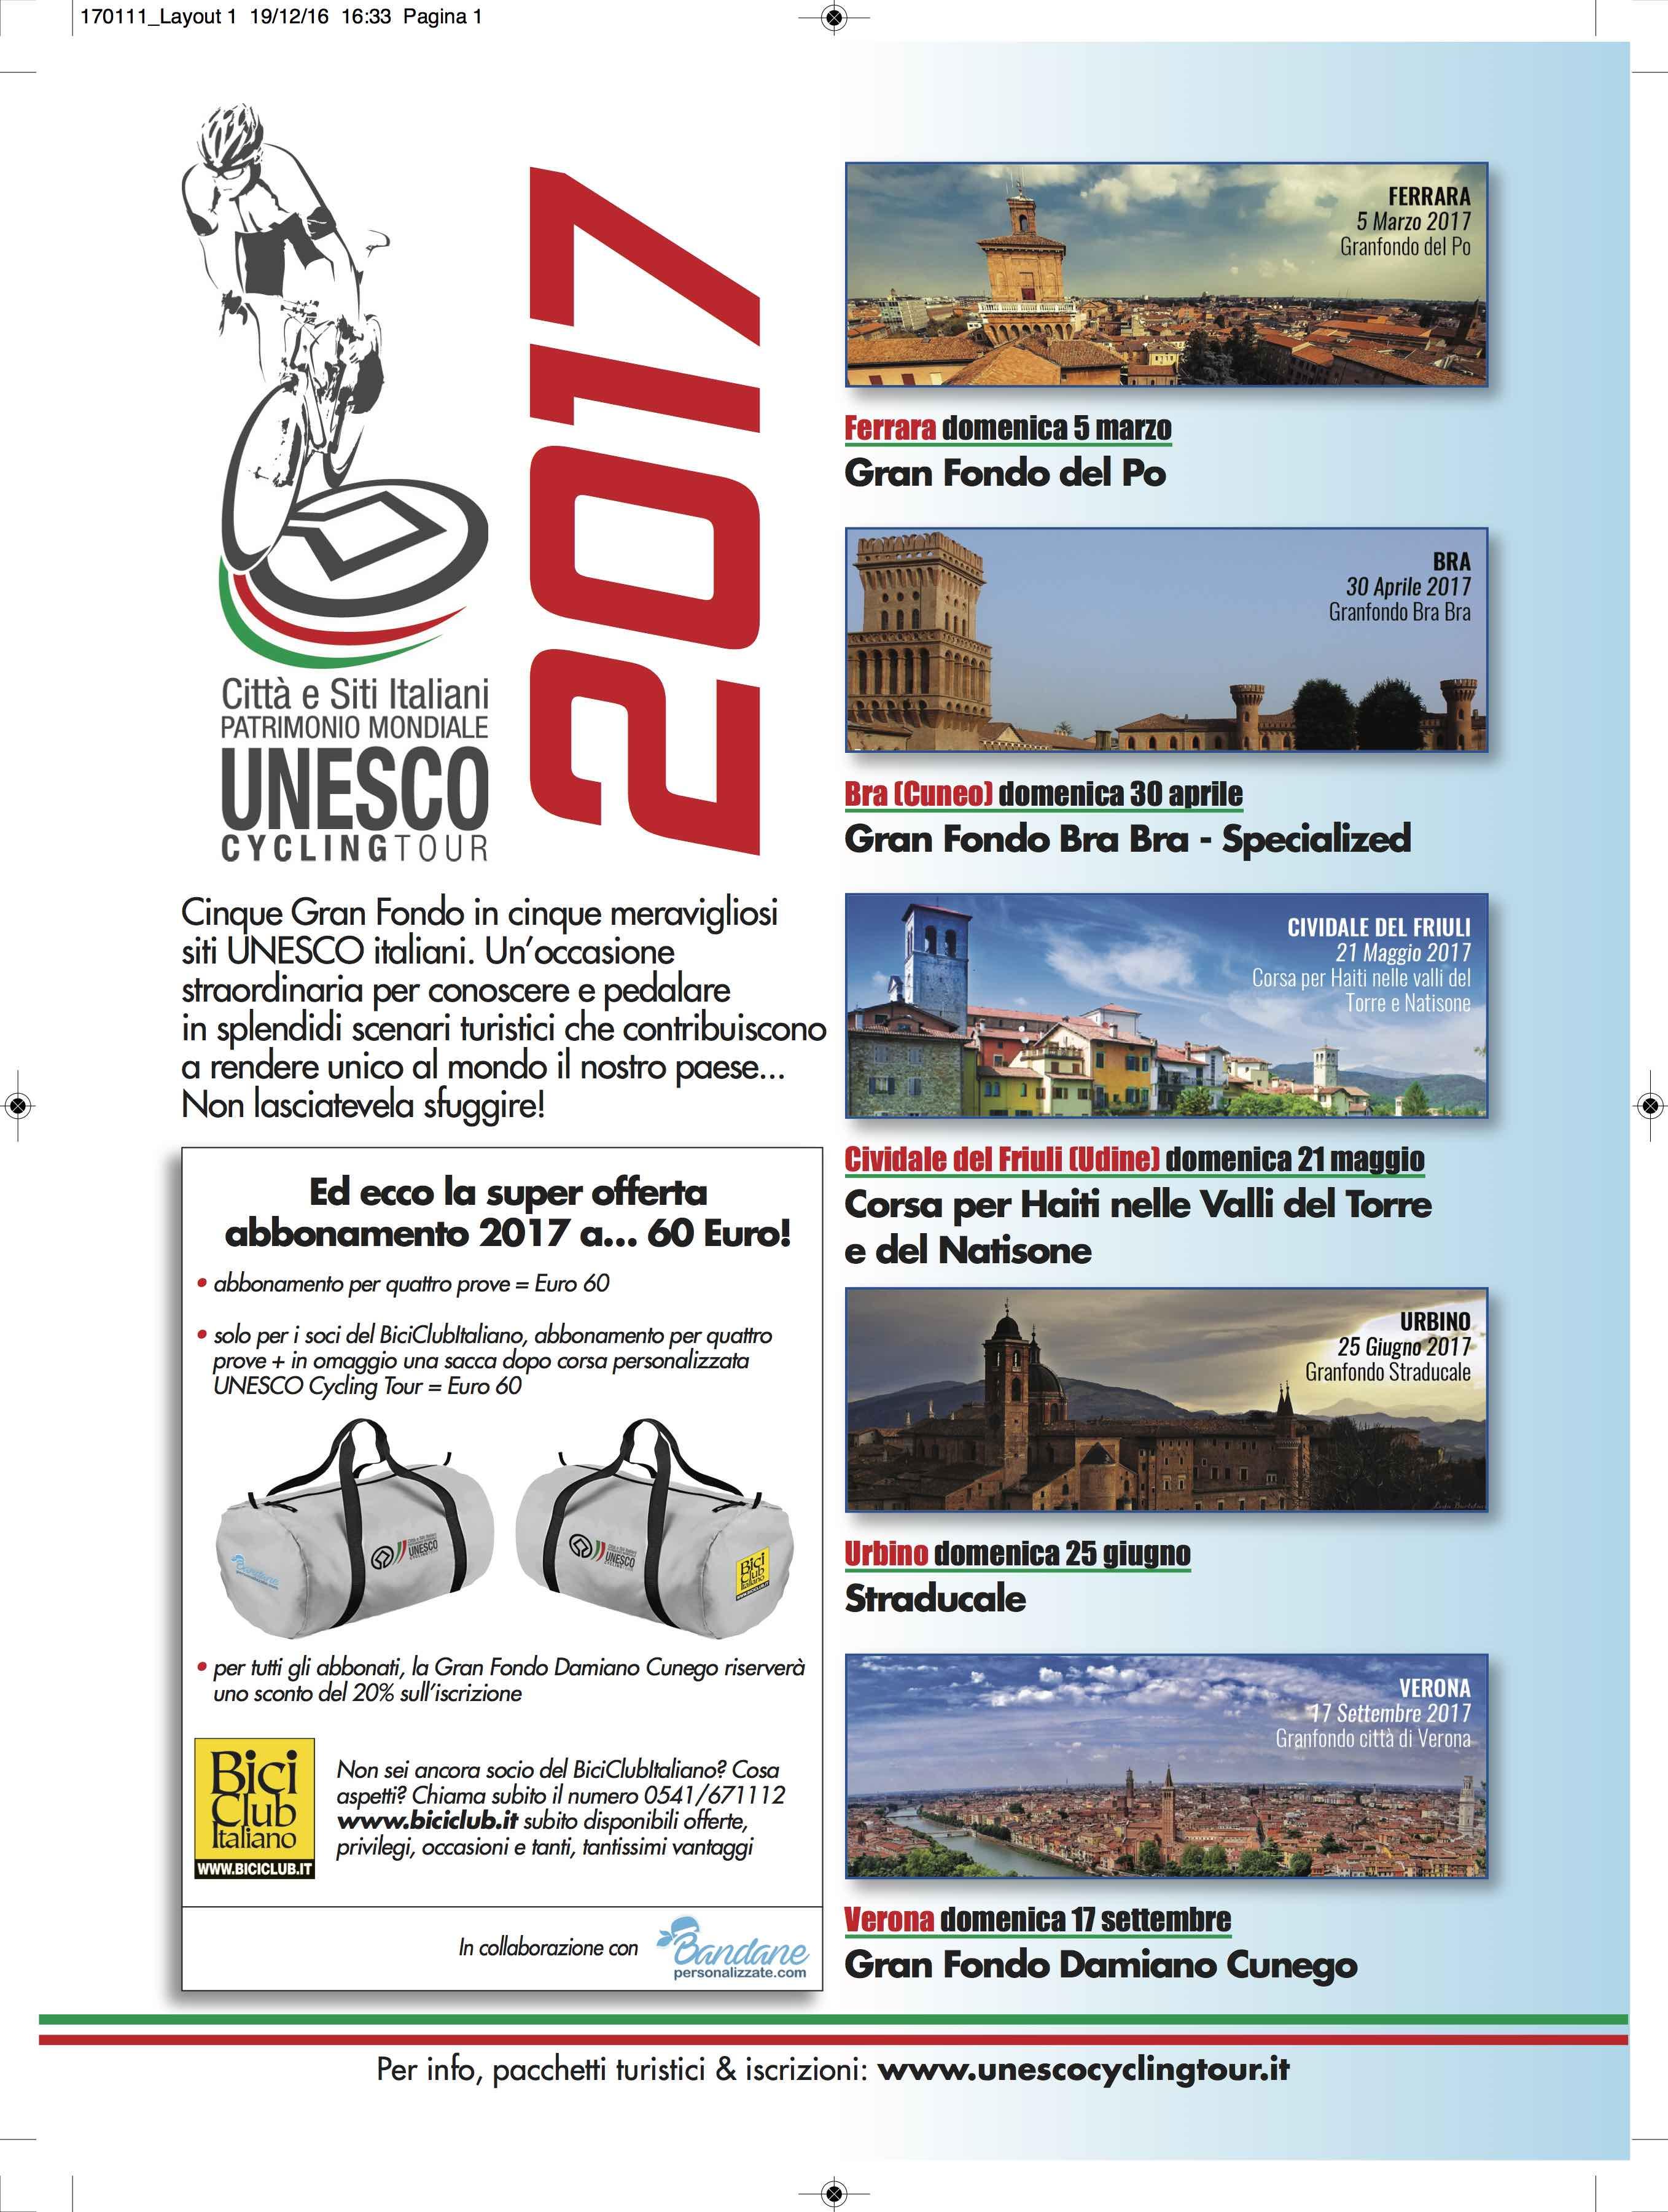 pagina-cicloturismo-_170111_layout-1